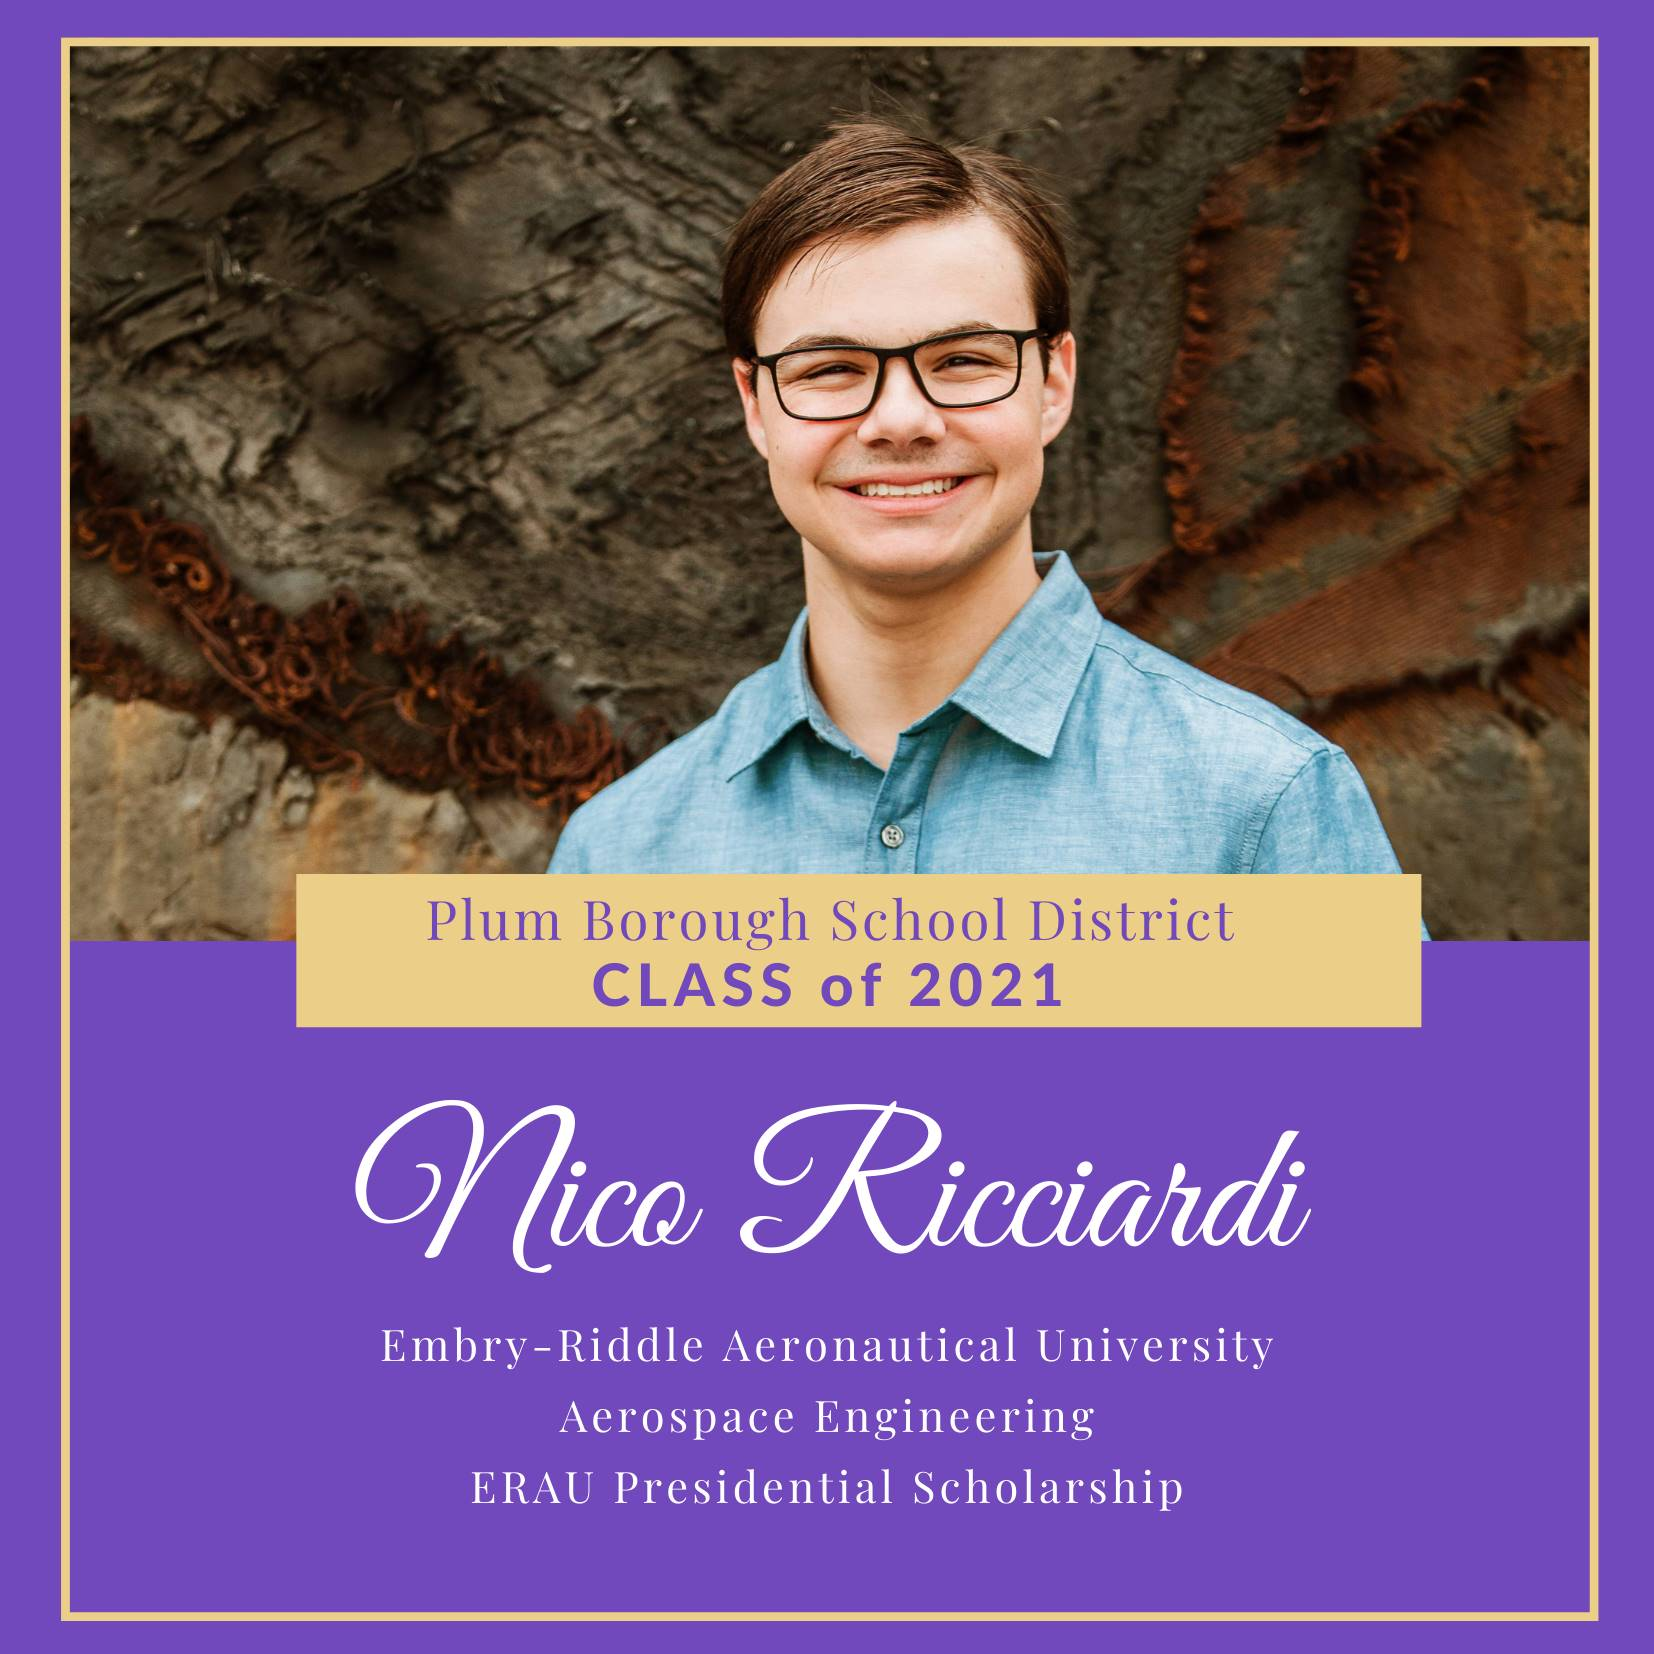 Congratulations to Nico Ricciardi, Class of 2021!